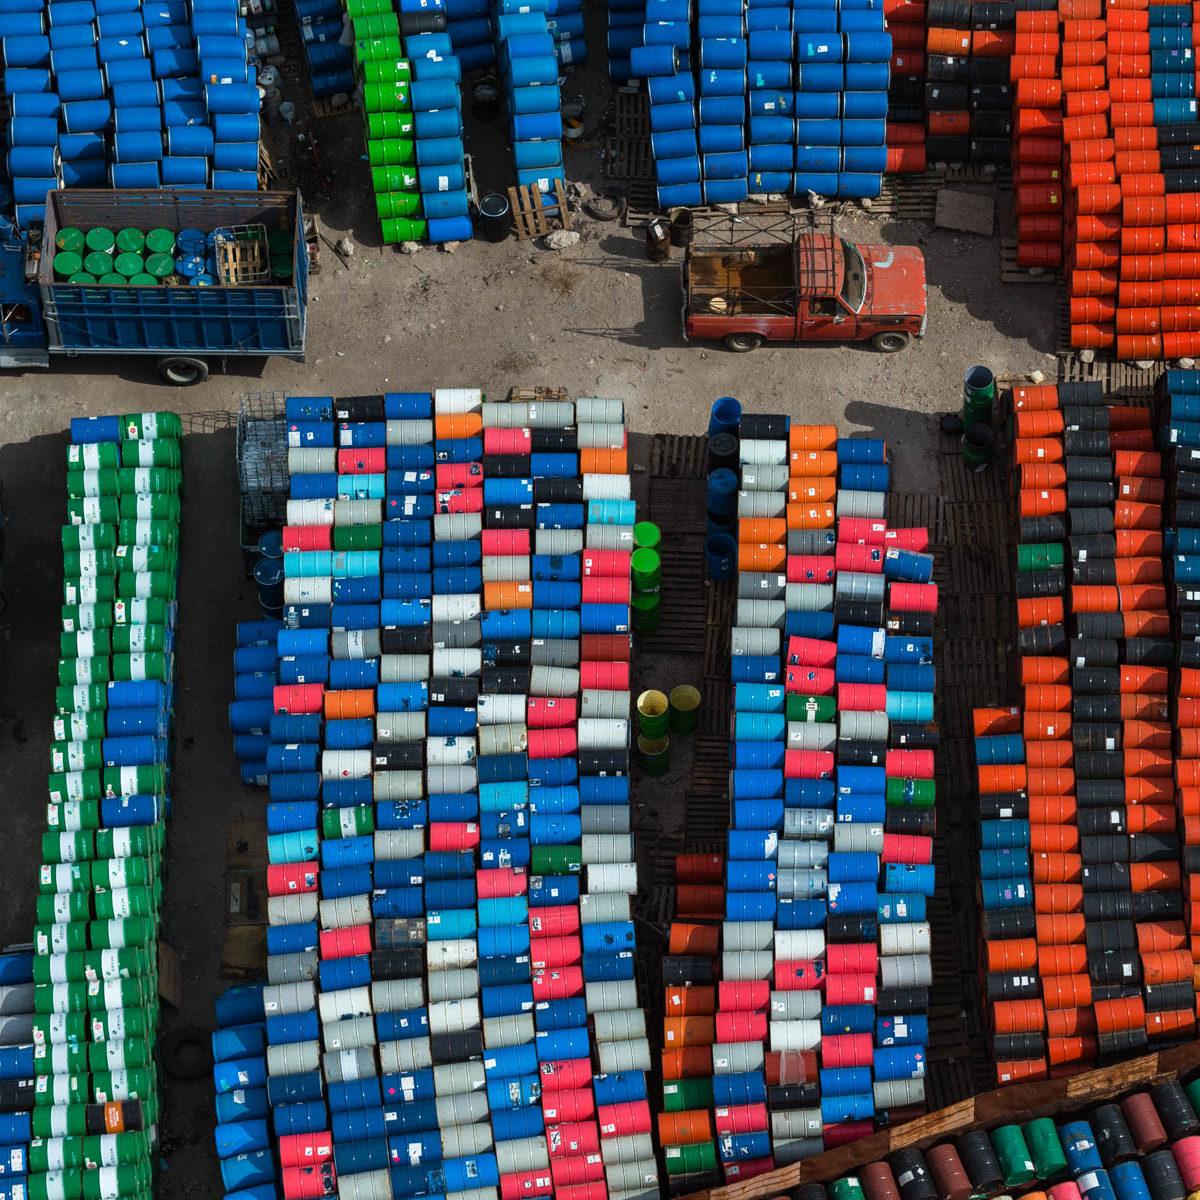 stockage de bidons à Teoloyucan (nord du Mexique) © Yann Arthus Bertrand/Mexique/Human 03-2013 (19°46'N - 99°10 W)